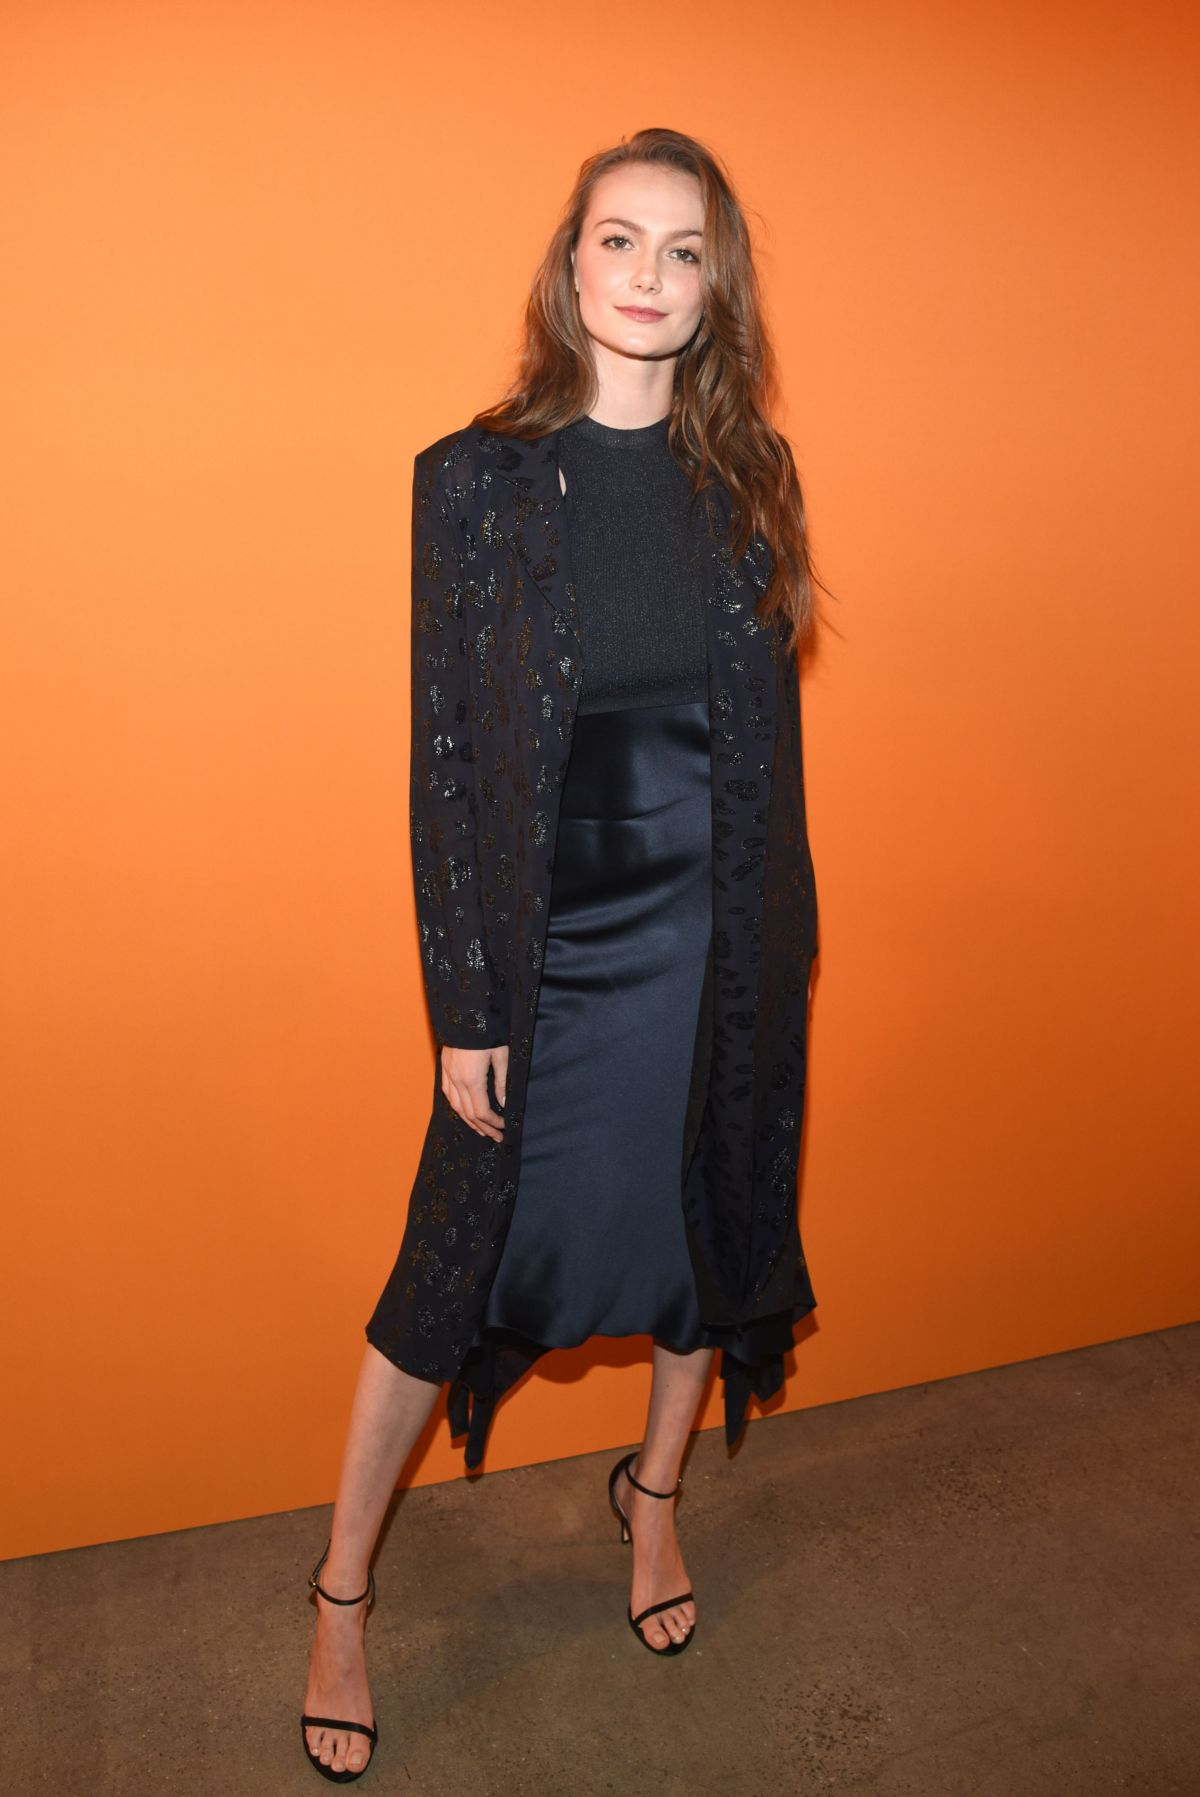 New York Designer Fashion: ANDI MATICHAK At Cushnie Fashion Show In New York 02/08